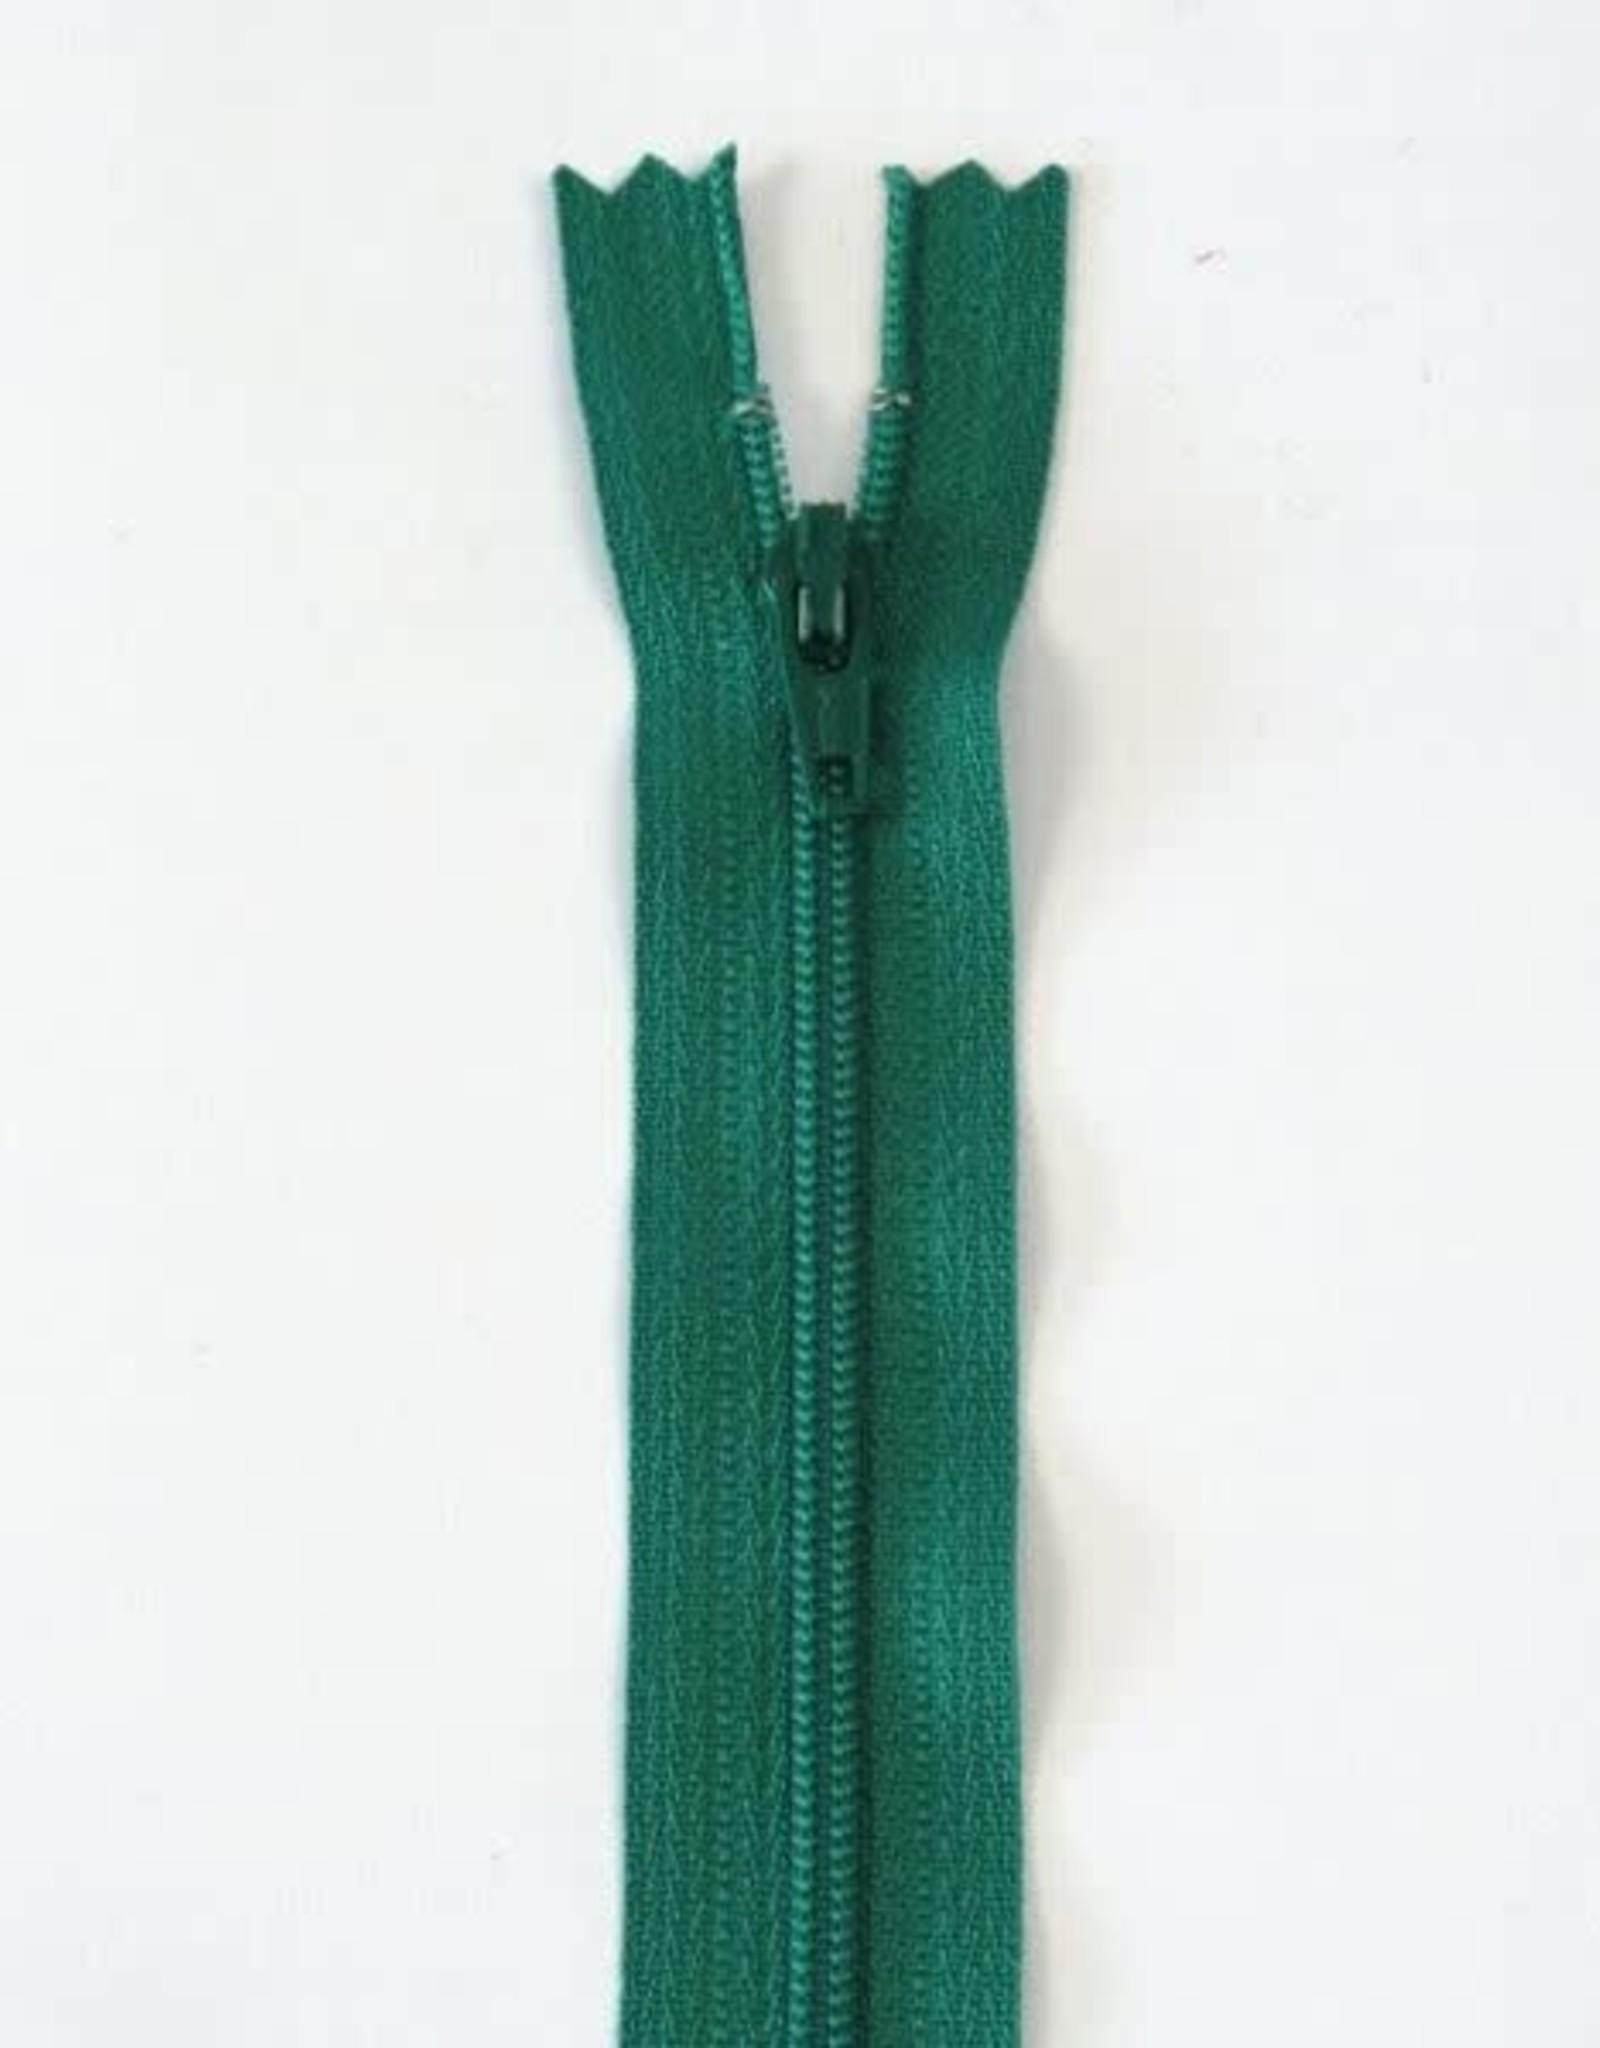 YKK Spiraalrits niet-DB 3mm grasgroen 540-15cm